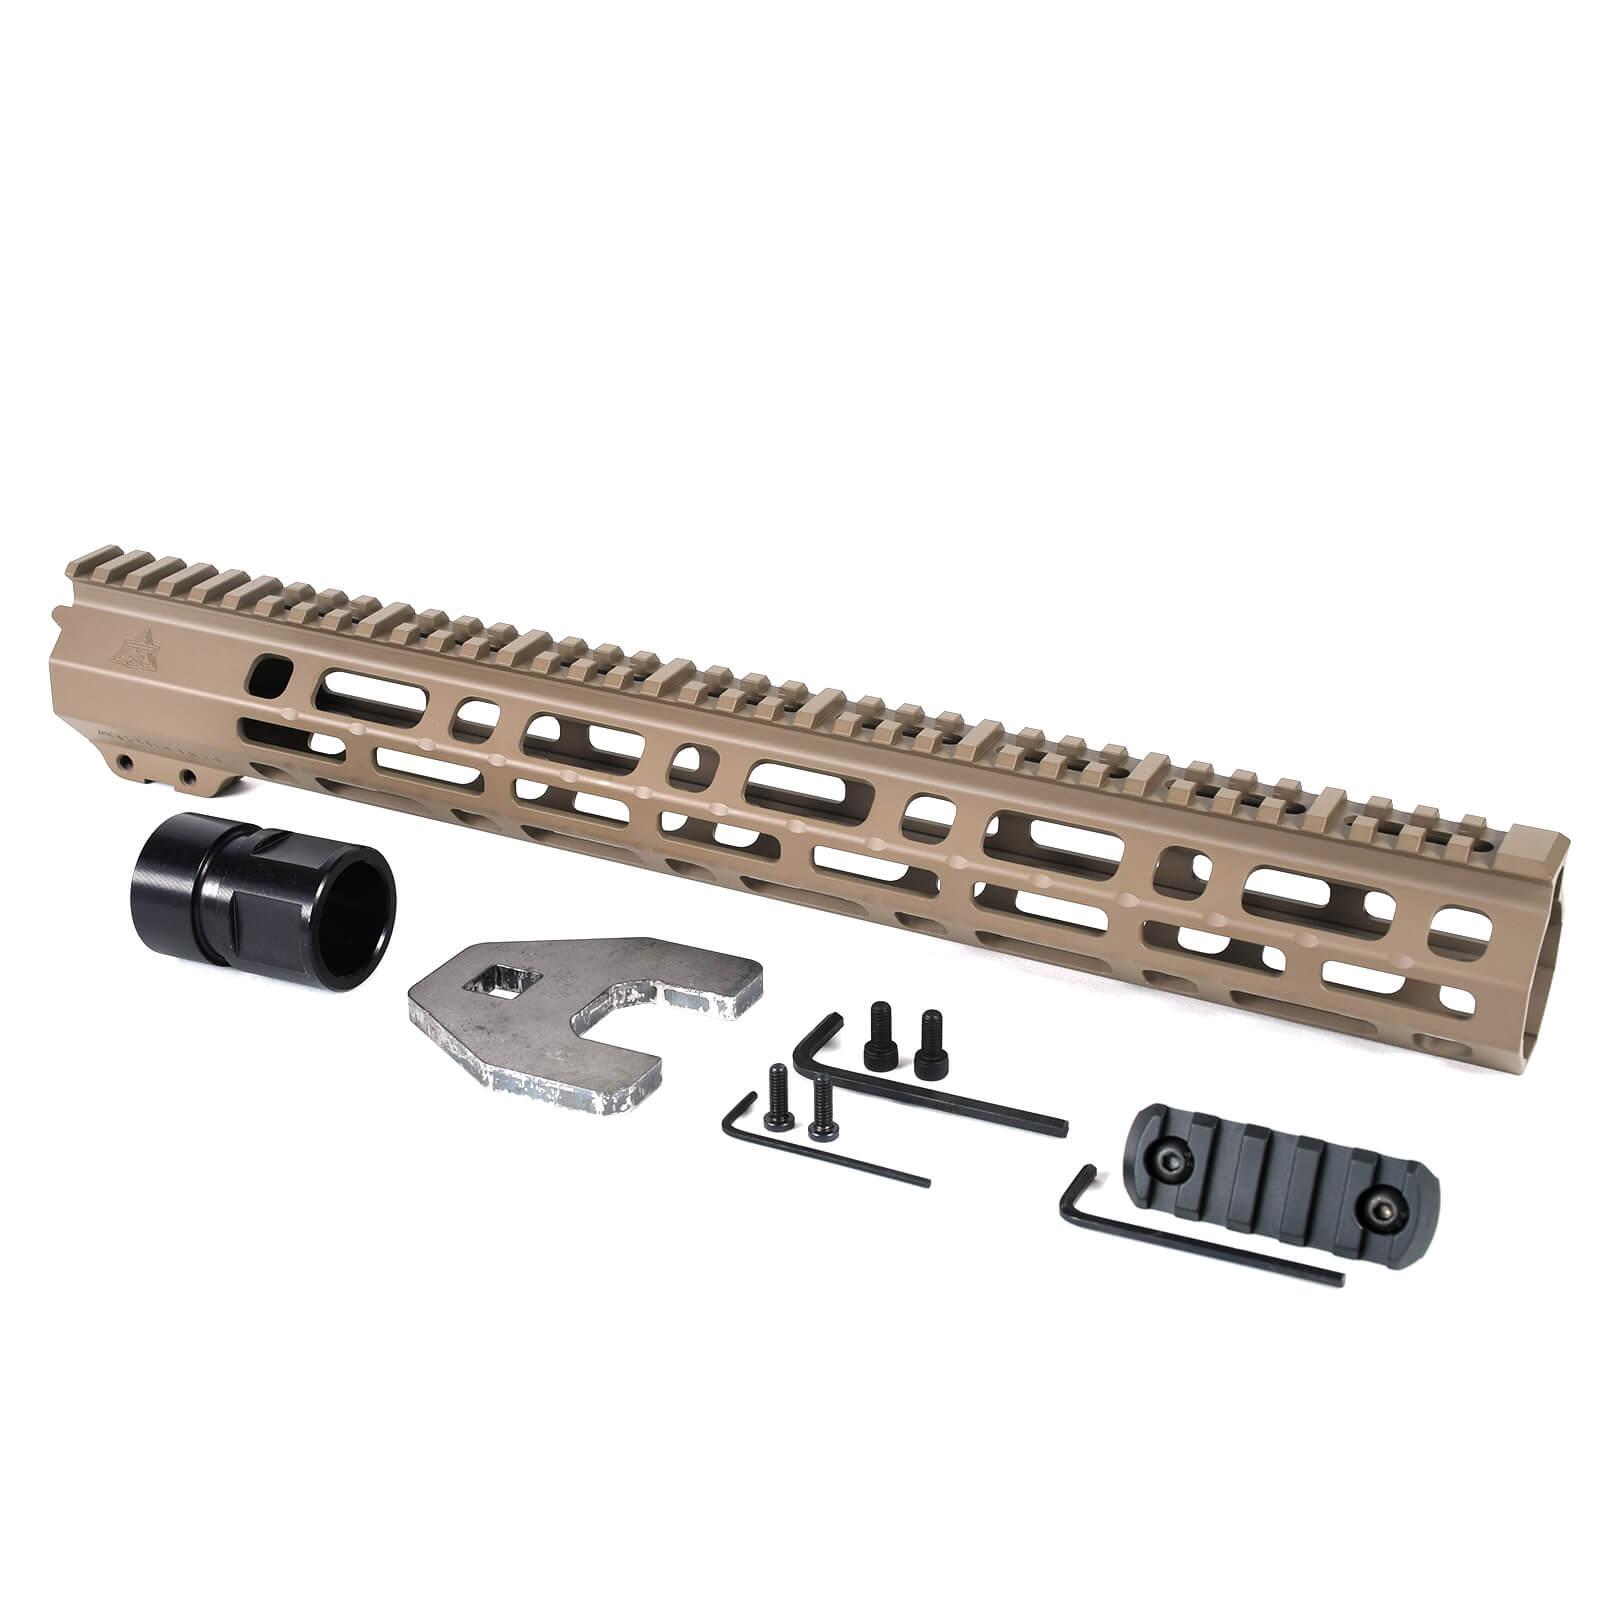 GOODTAC Precision Aluminum M-LOK Handguard Picatinney Rail 7Slots